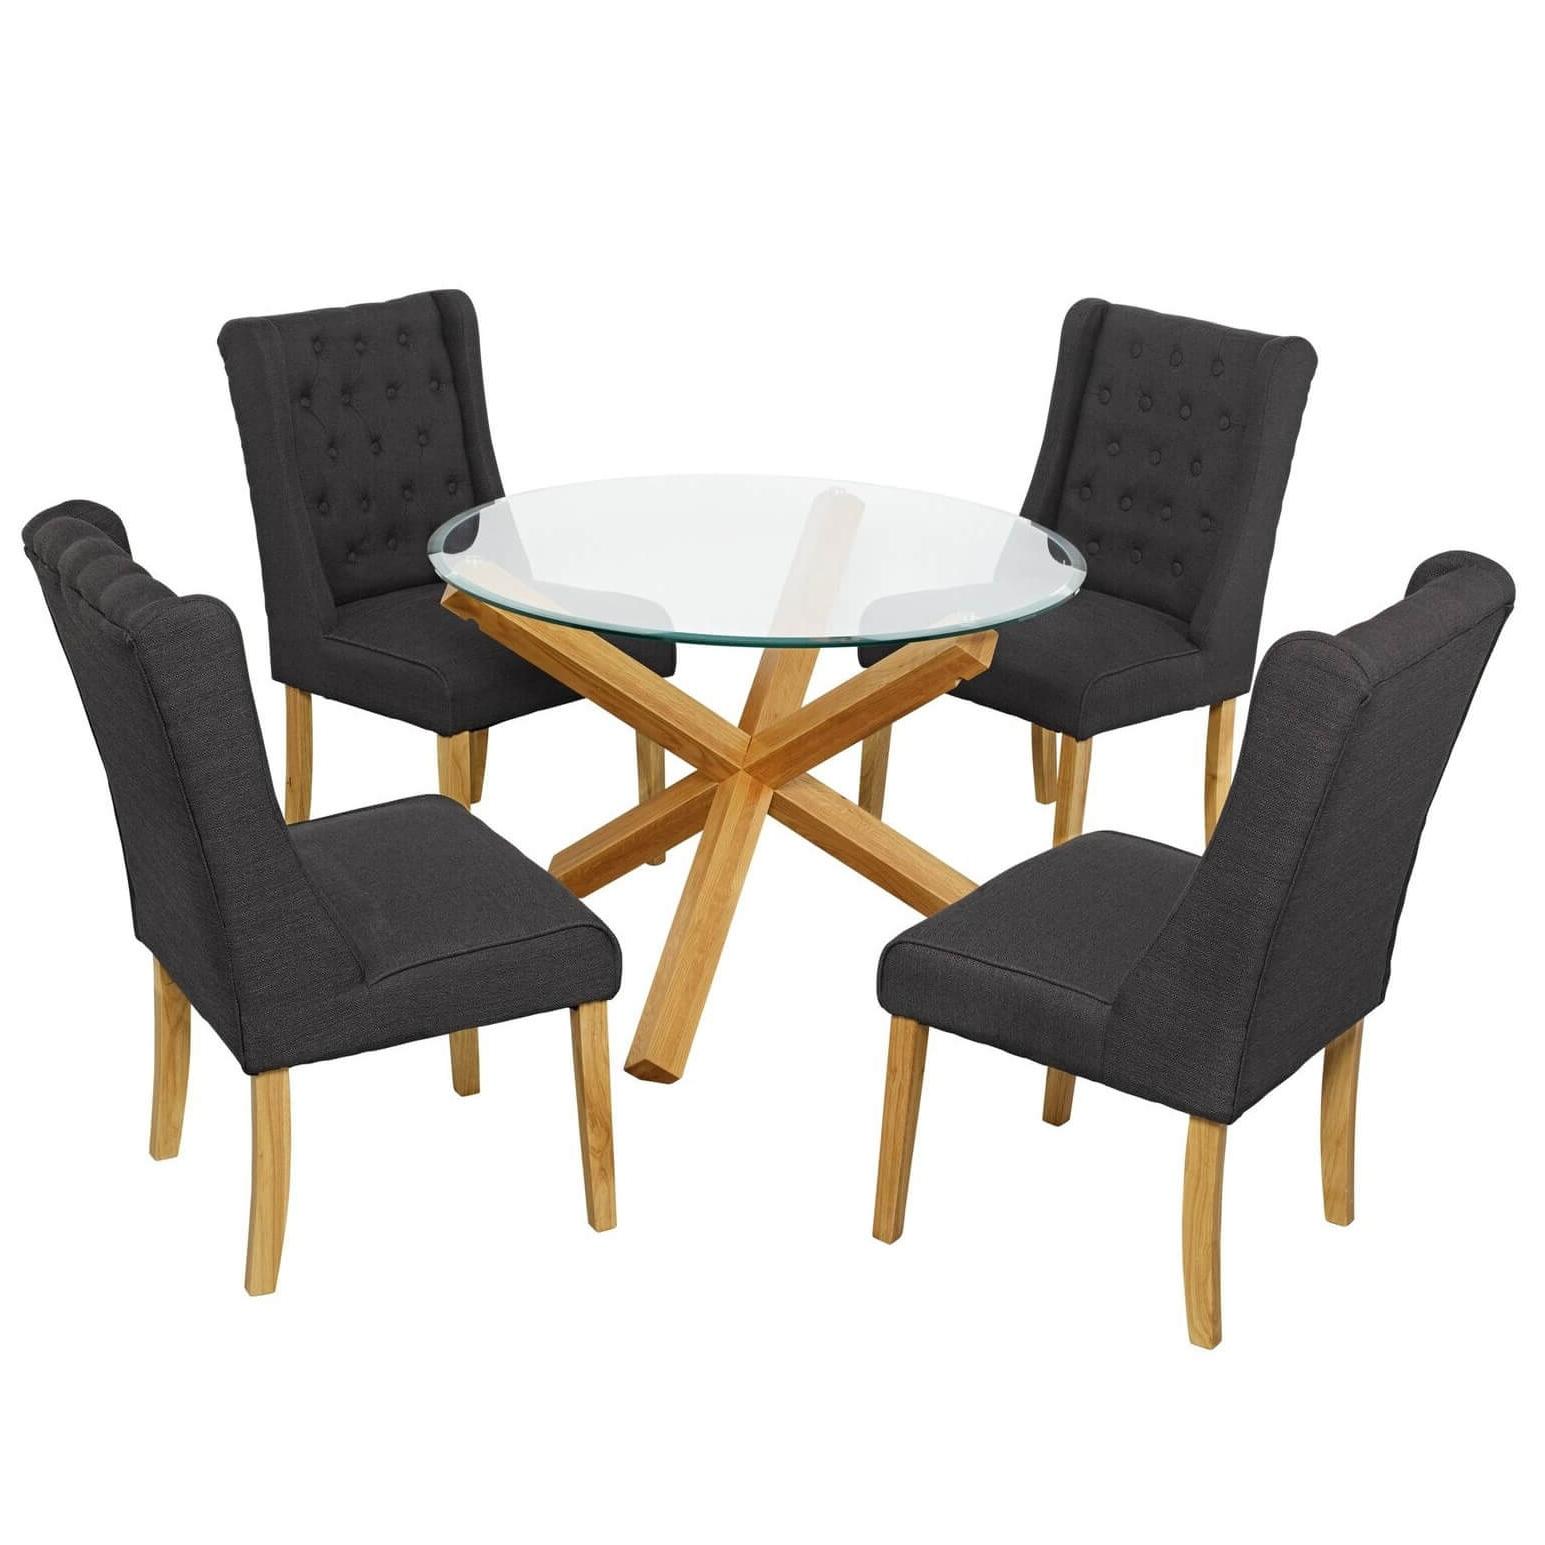 Fads Regarding Favorite Verona Dining Tables (View 15 of 25)